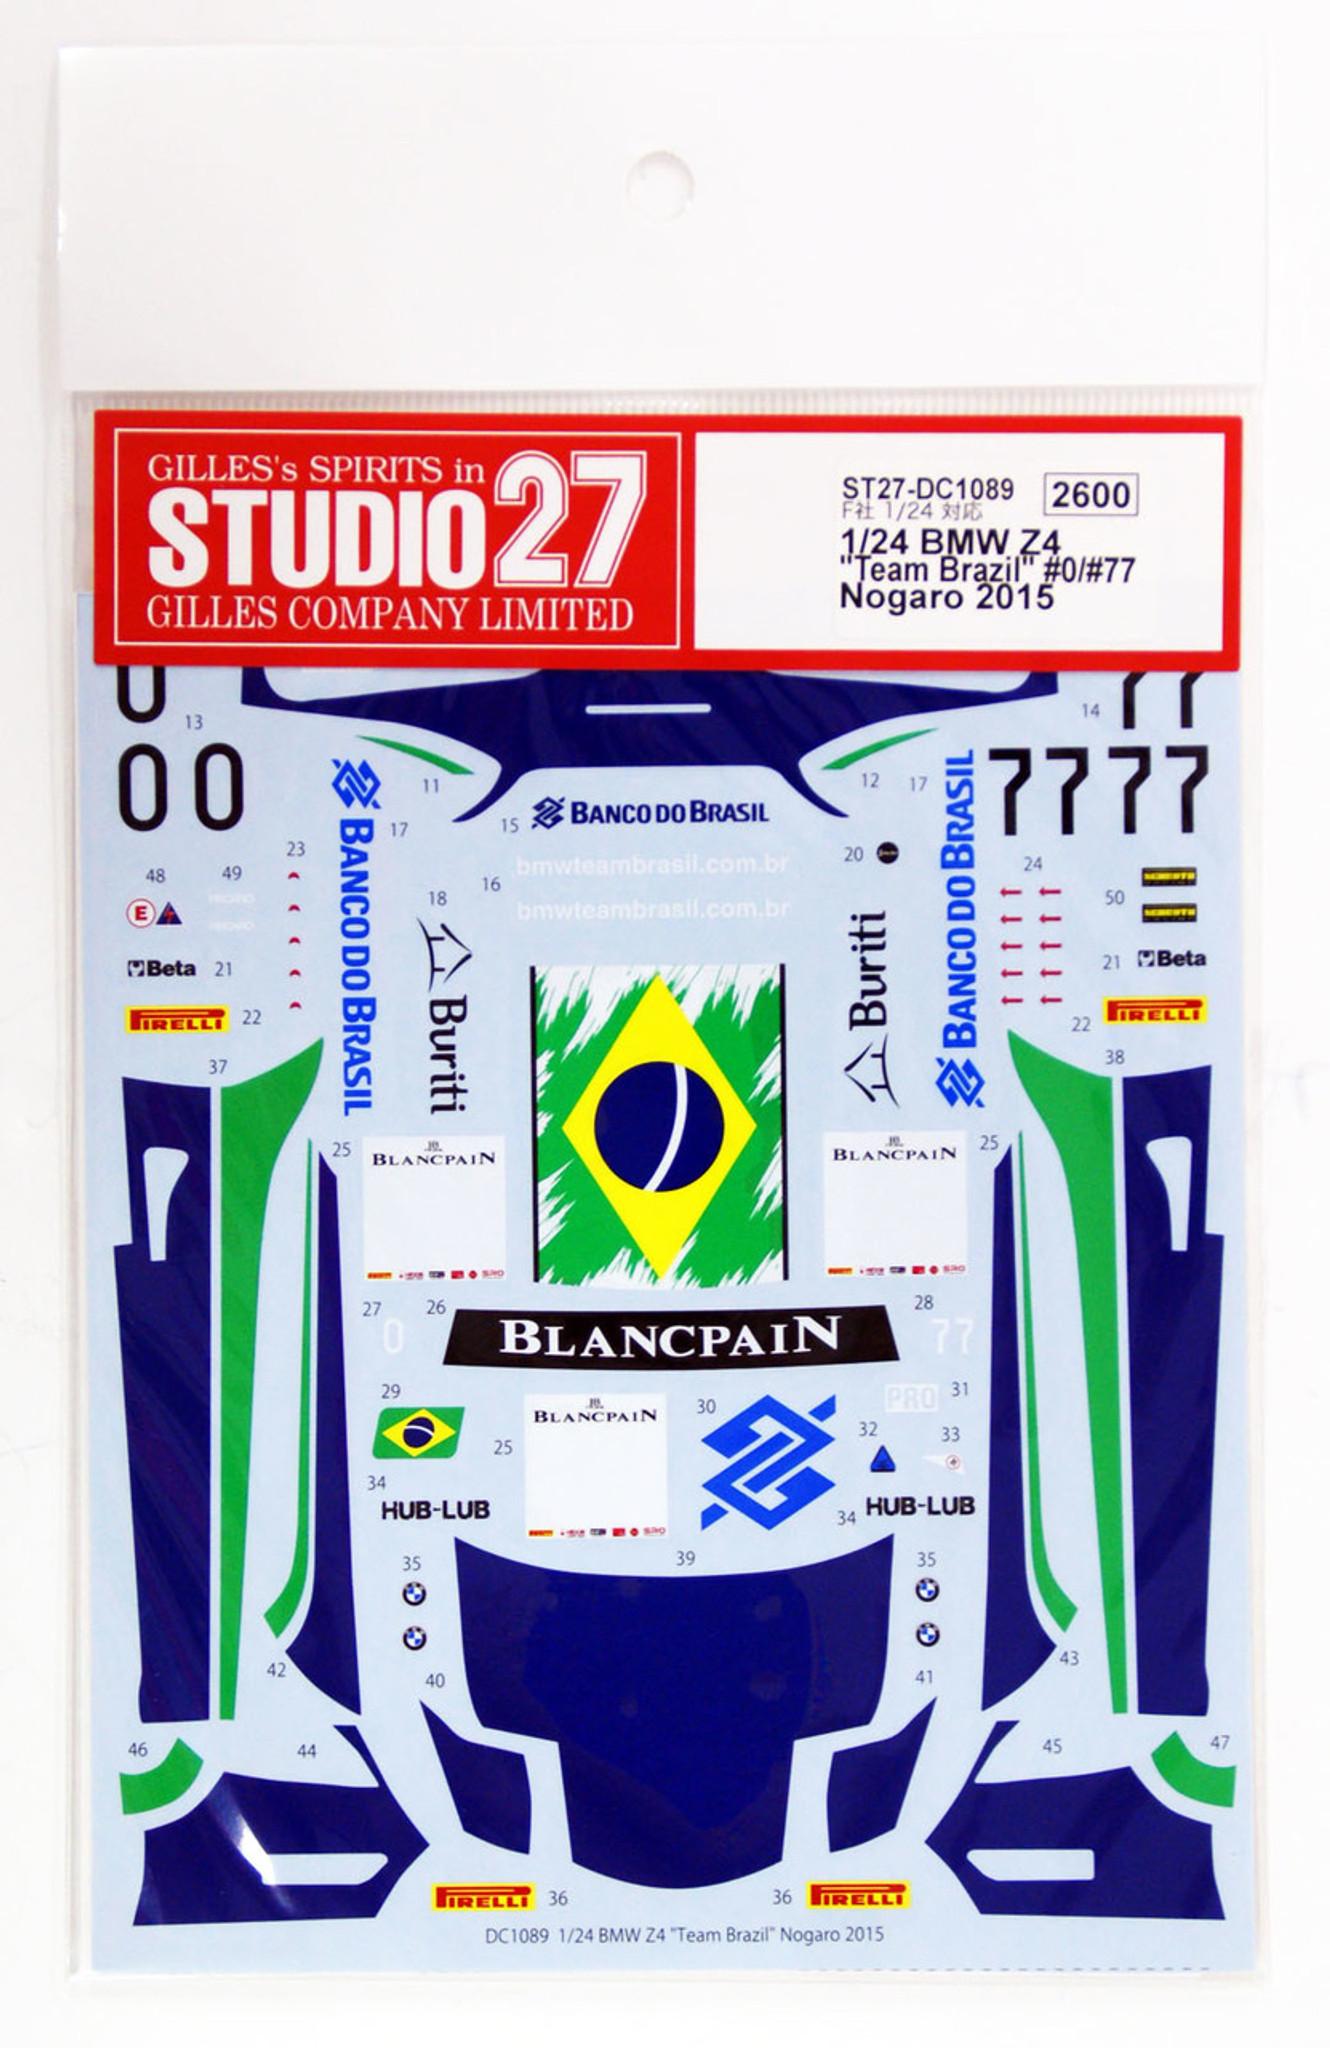 Studio27 St27 Dc1089 Bmw Z4 Team Brazil 0 77 Nogaro